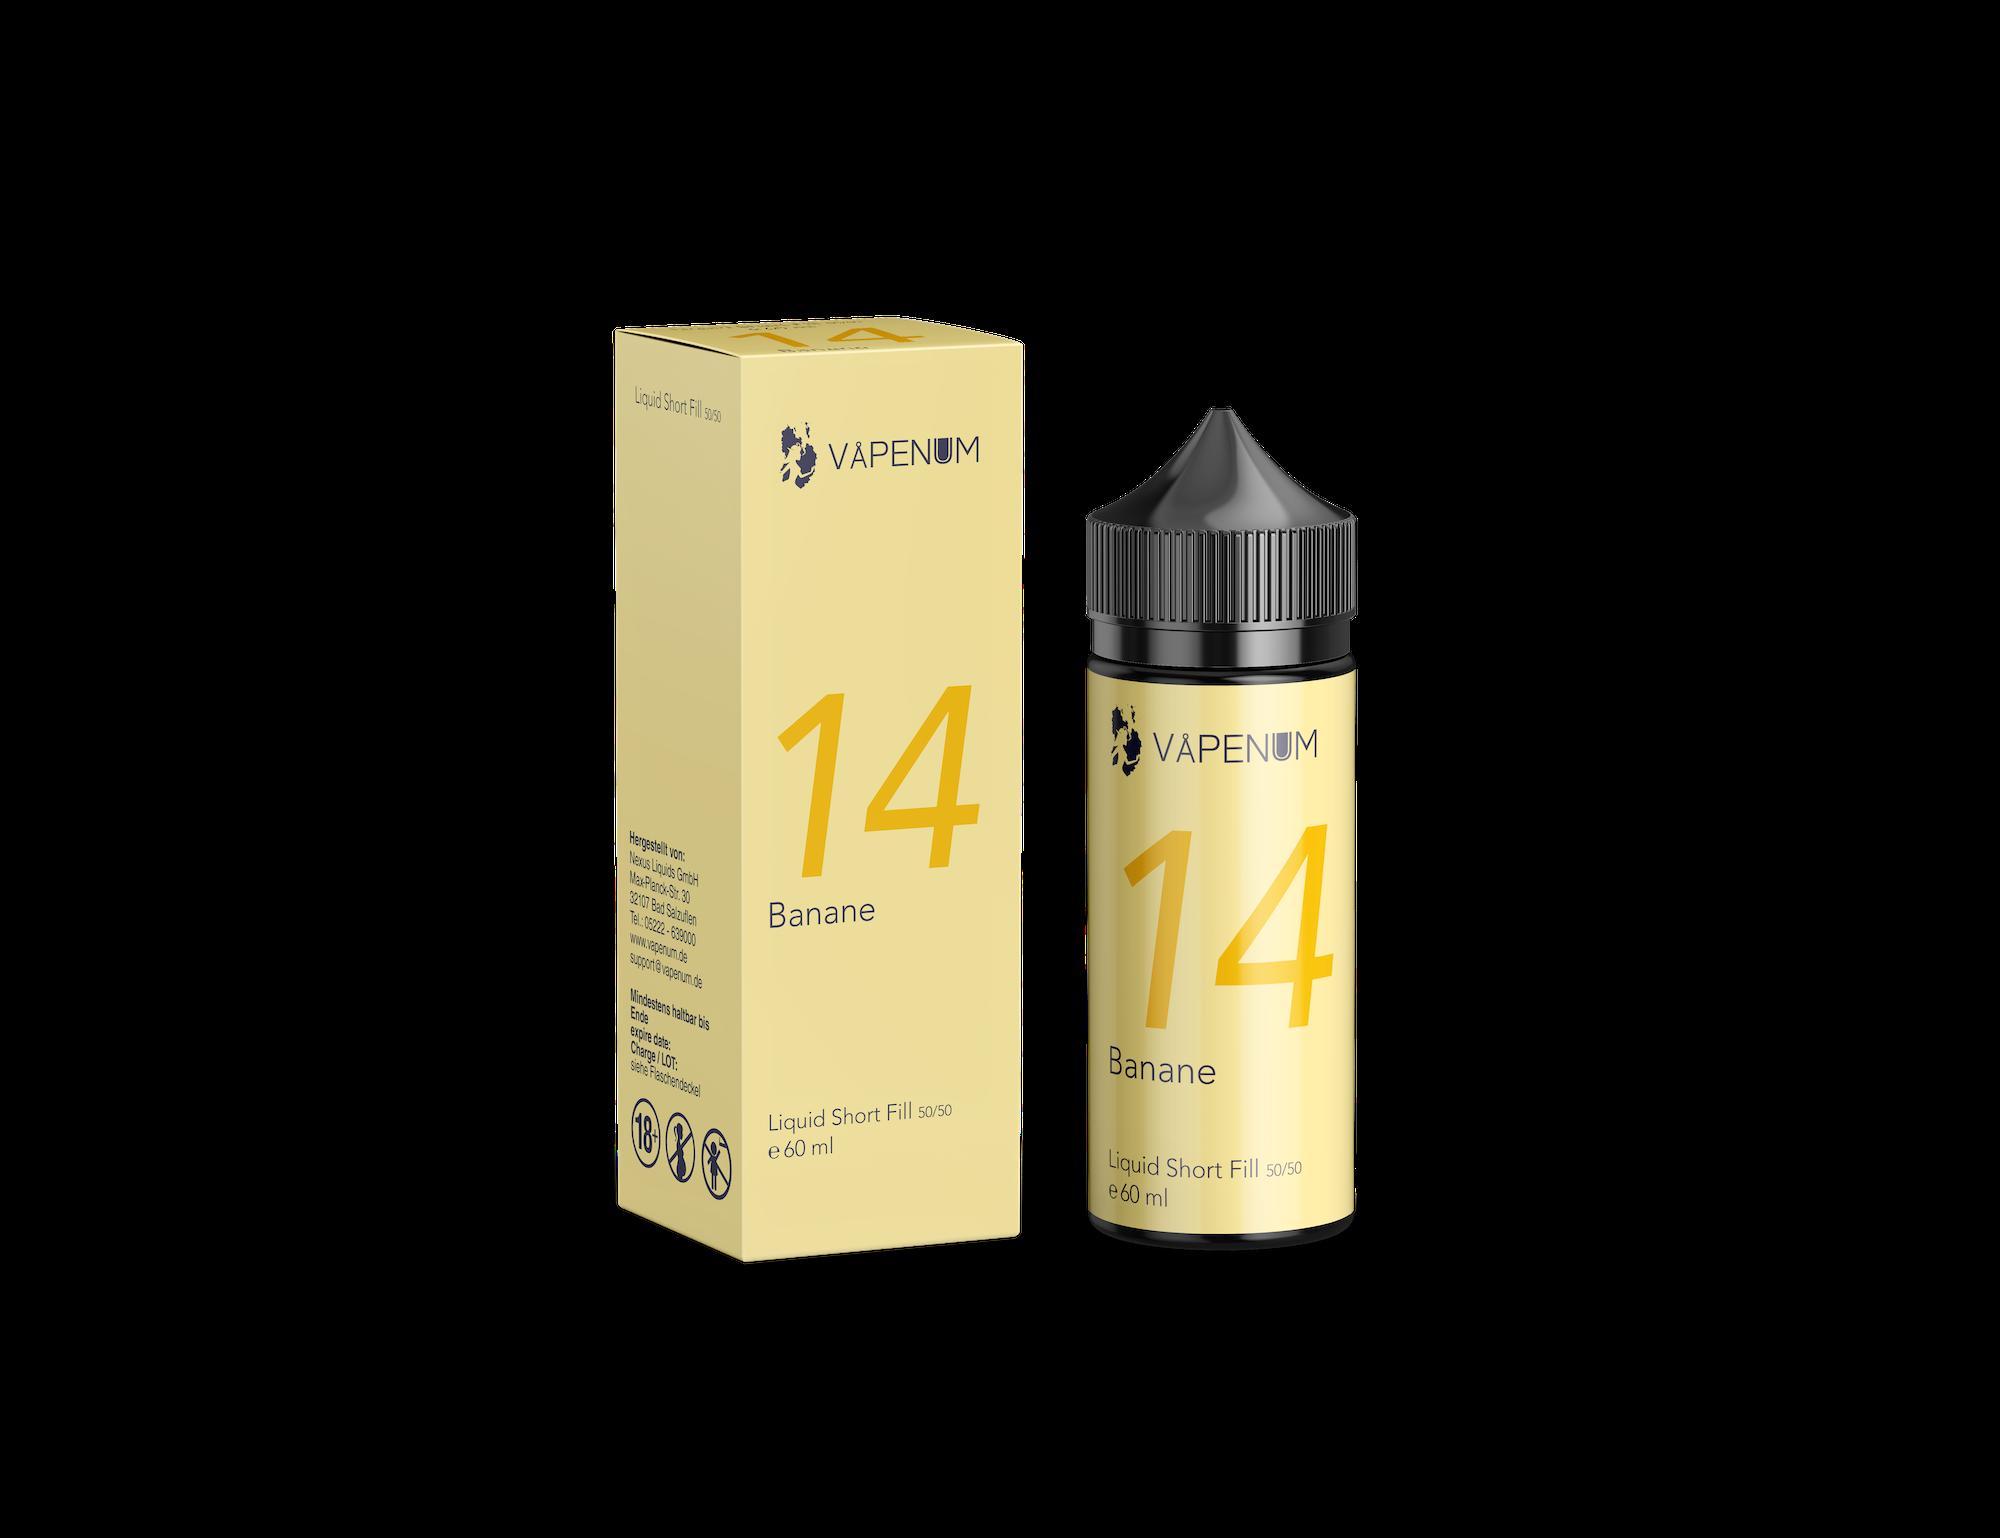 Vapenum Shortfill 14 - Banane